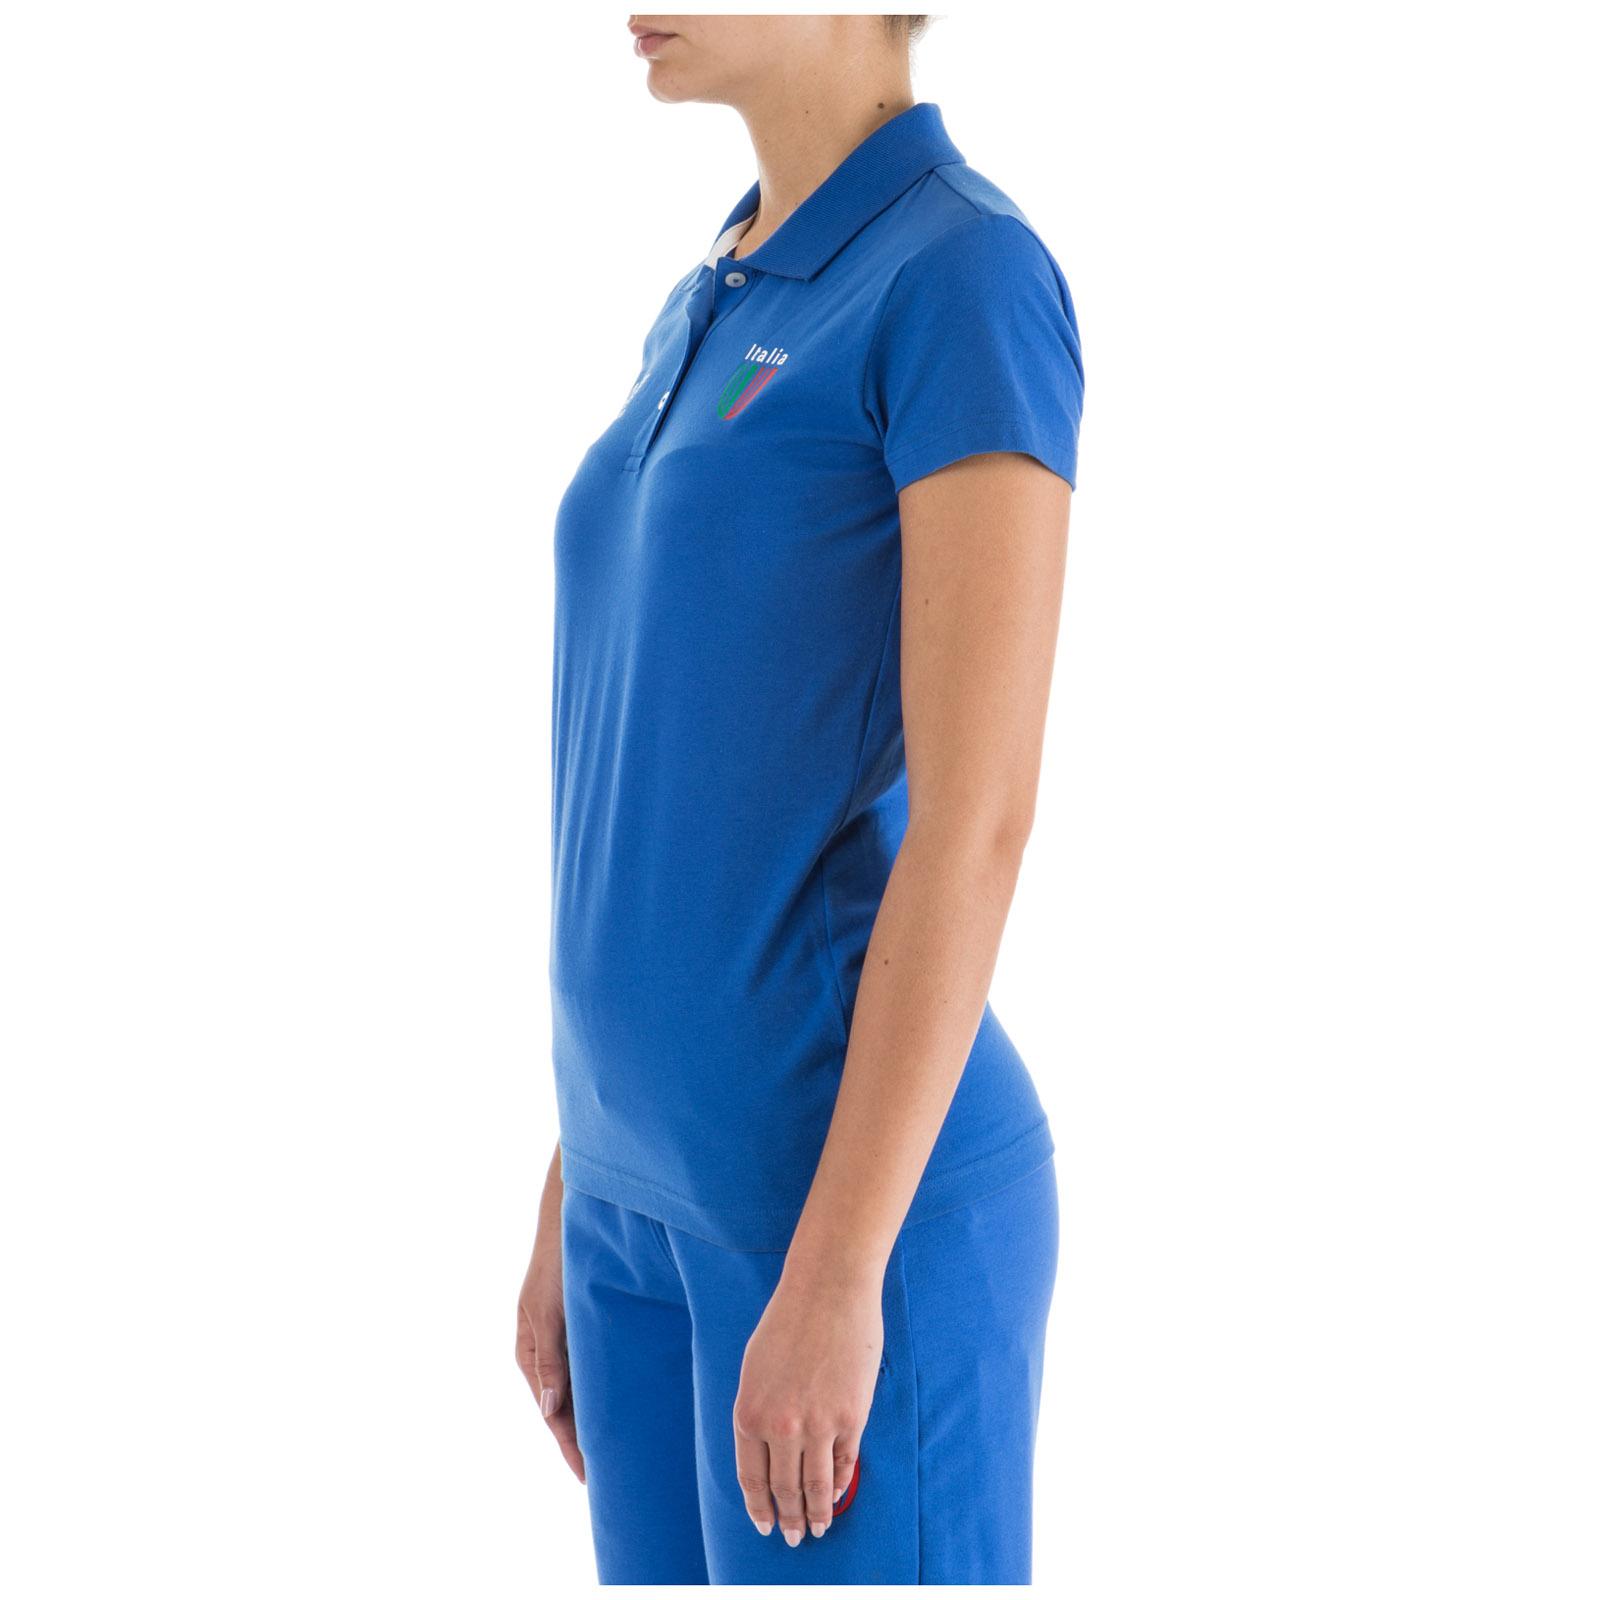 Women's t-shirt polo style short sleeve italia team